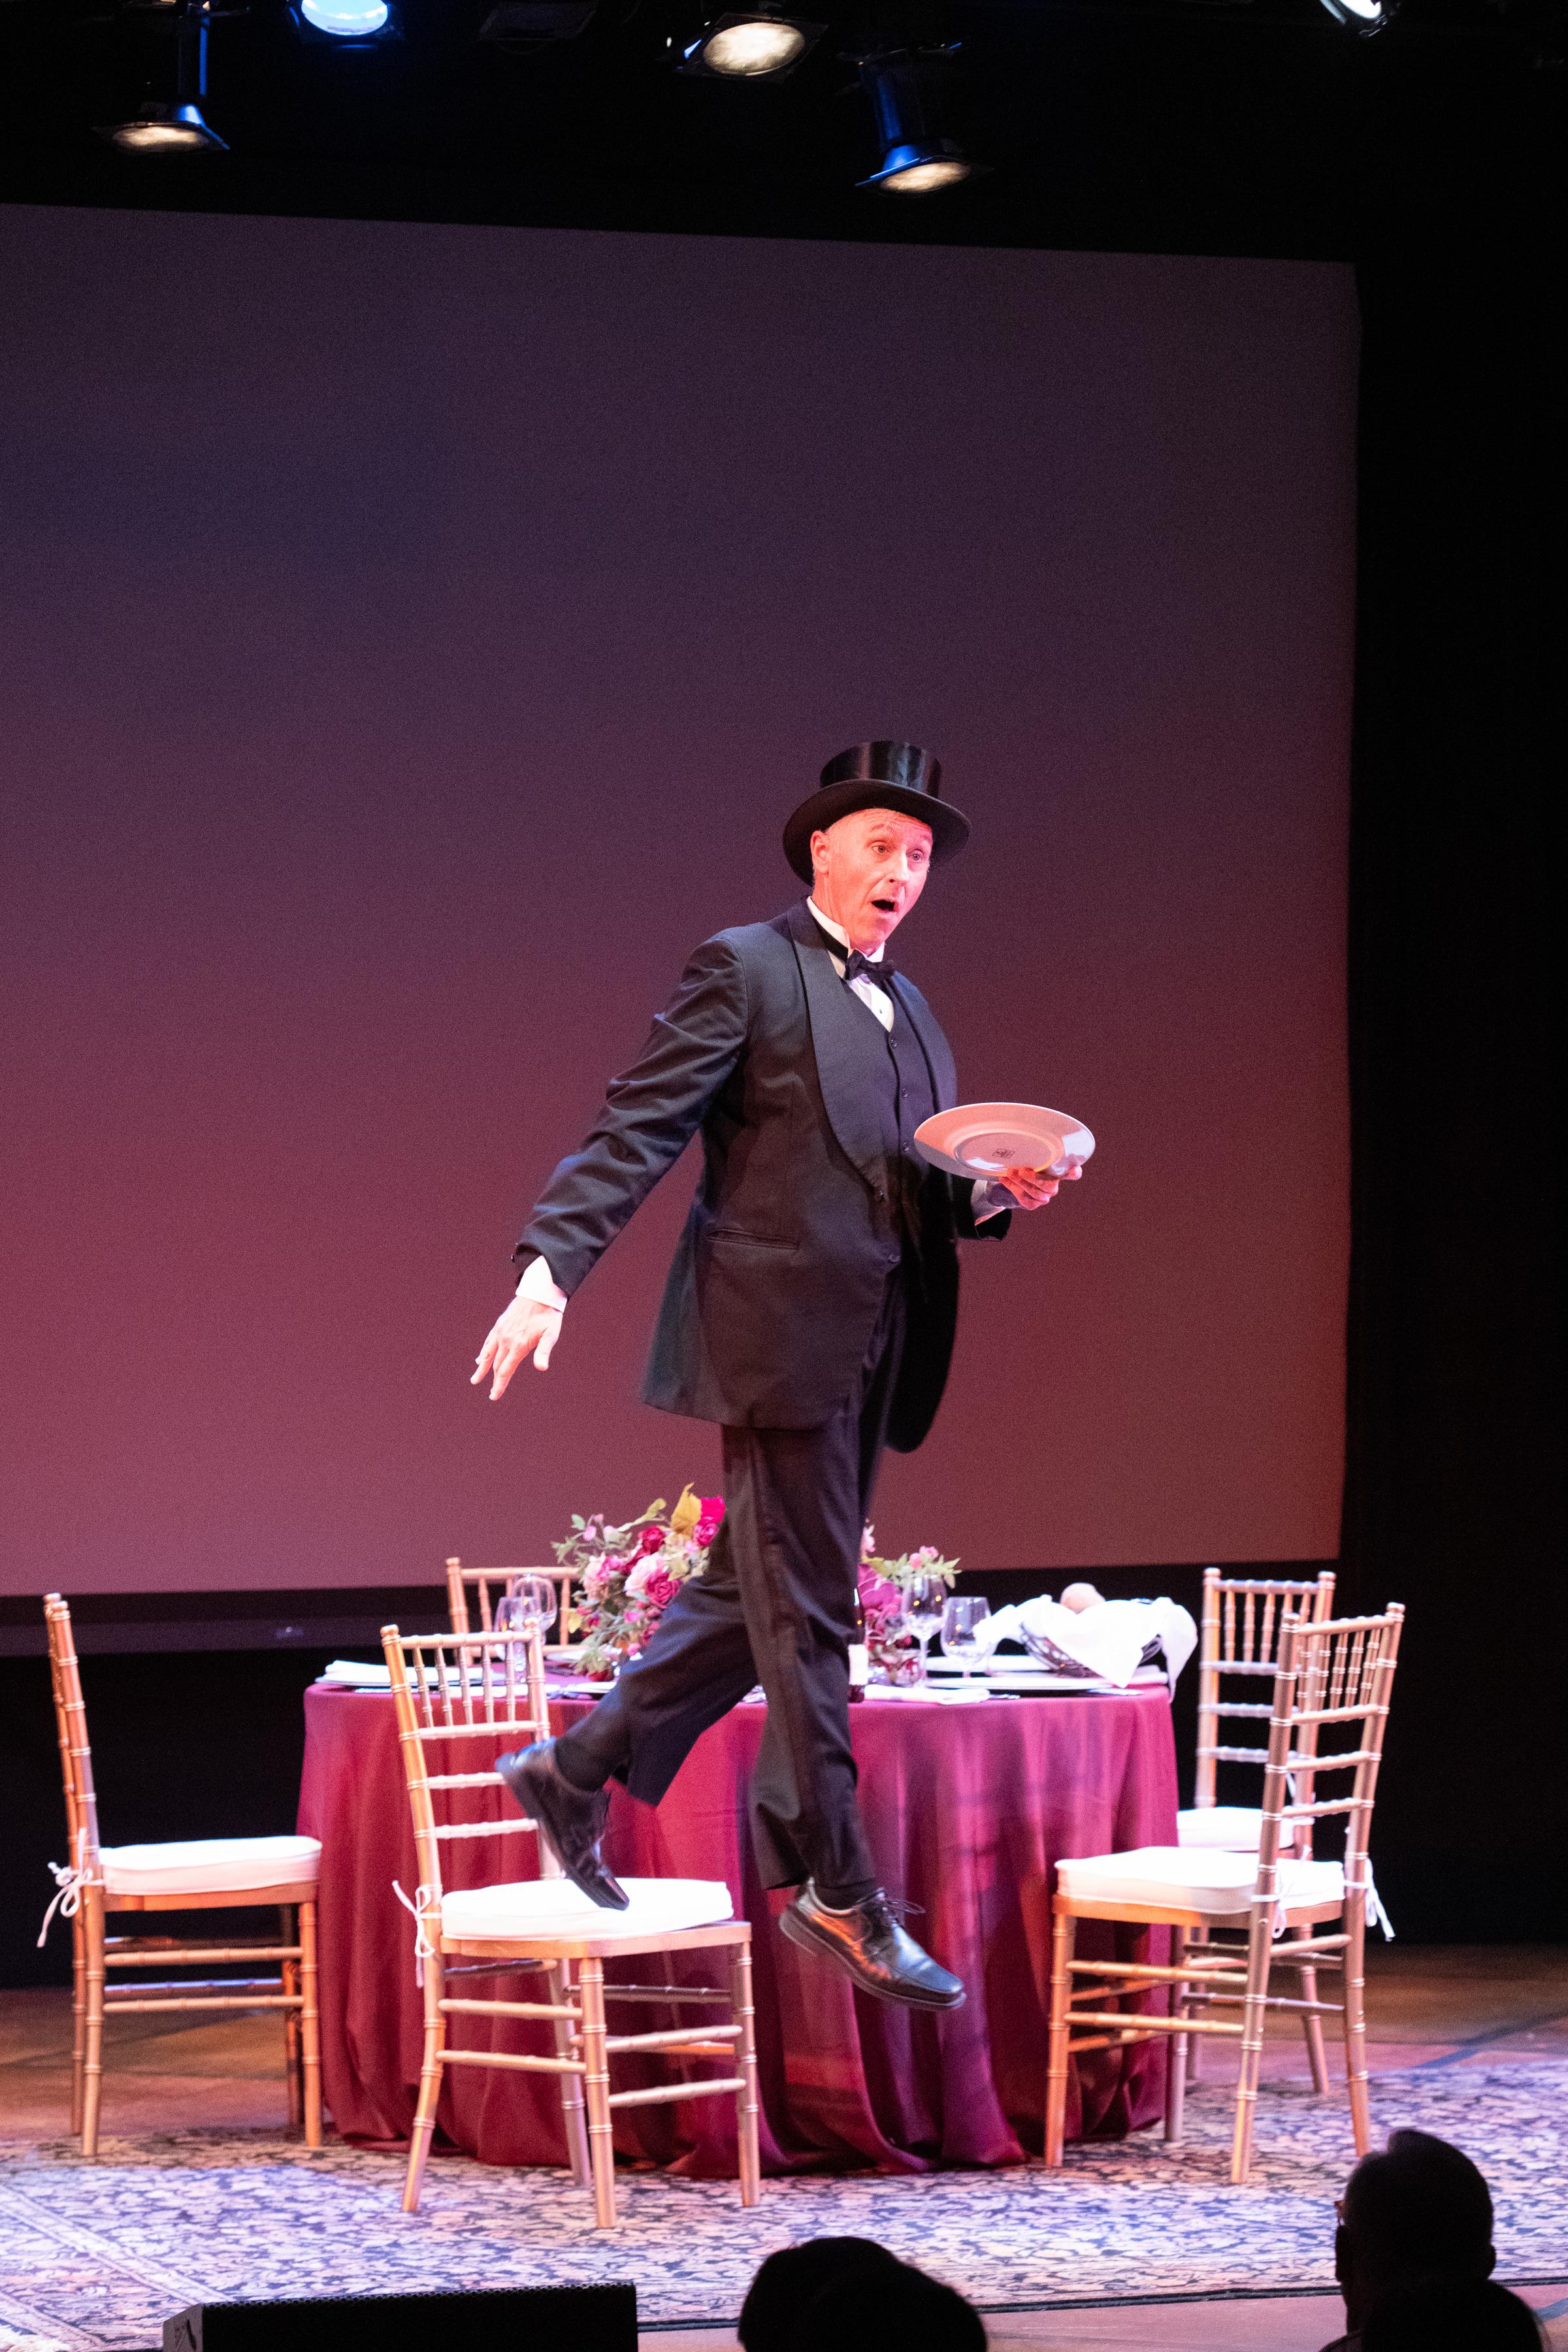 Michael Patrick Gaffney in THE OLDEST LIVING CATER WAITER. Photo by Ben Krantz Studio